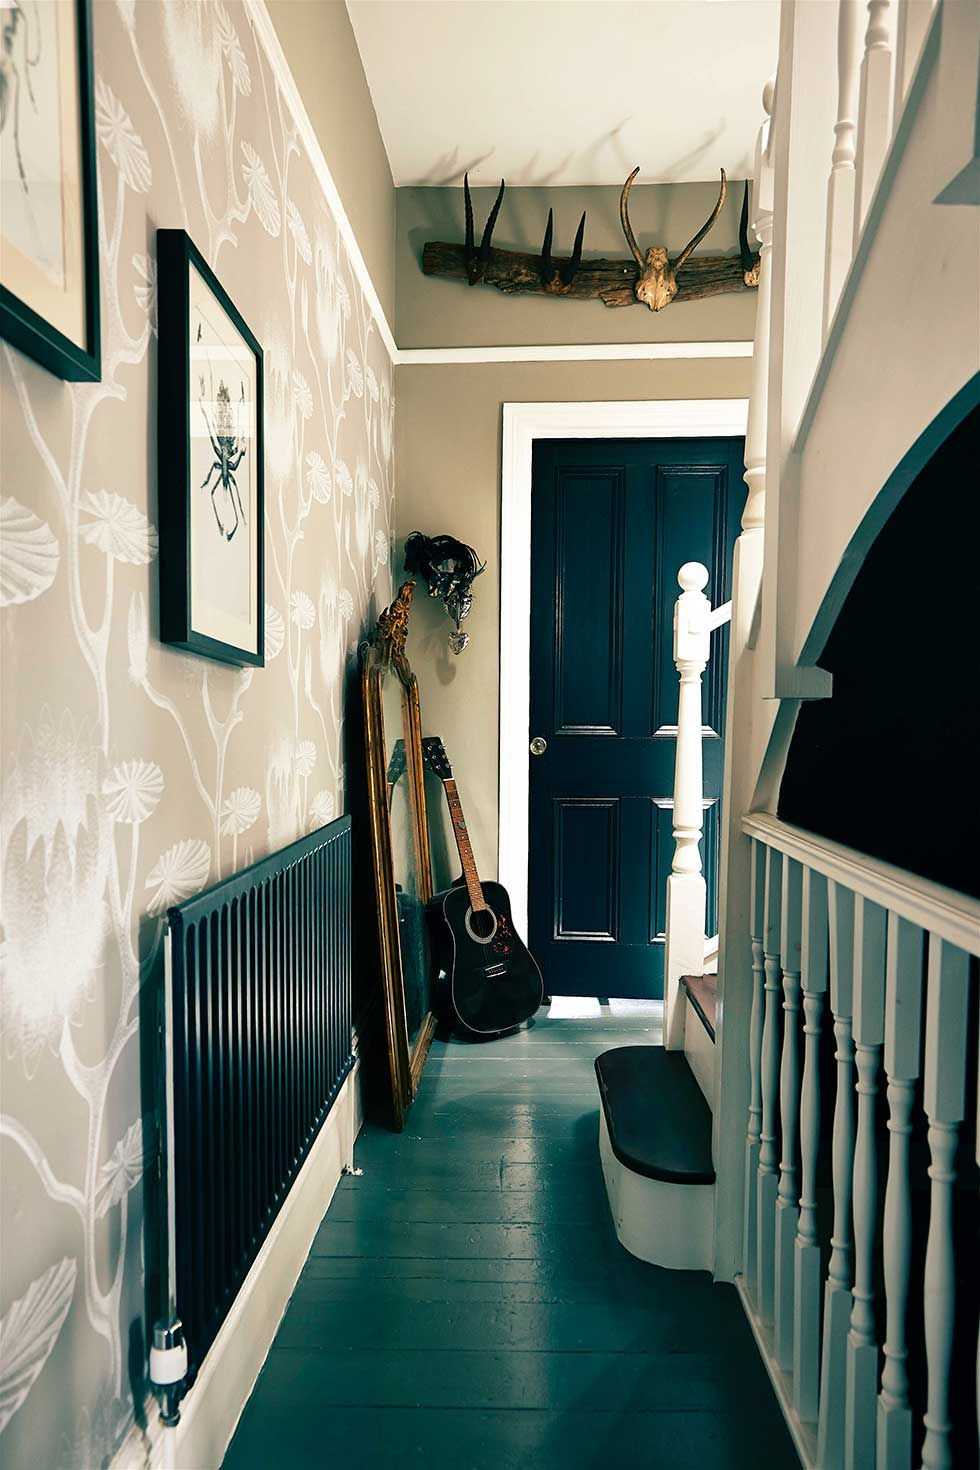 Onebedroom apartment to eclectic duplex One bedroom